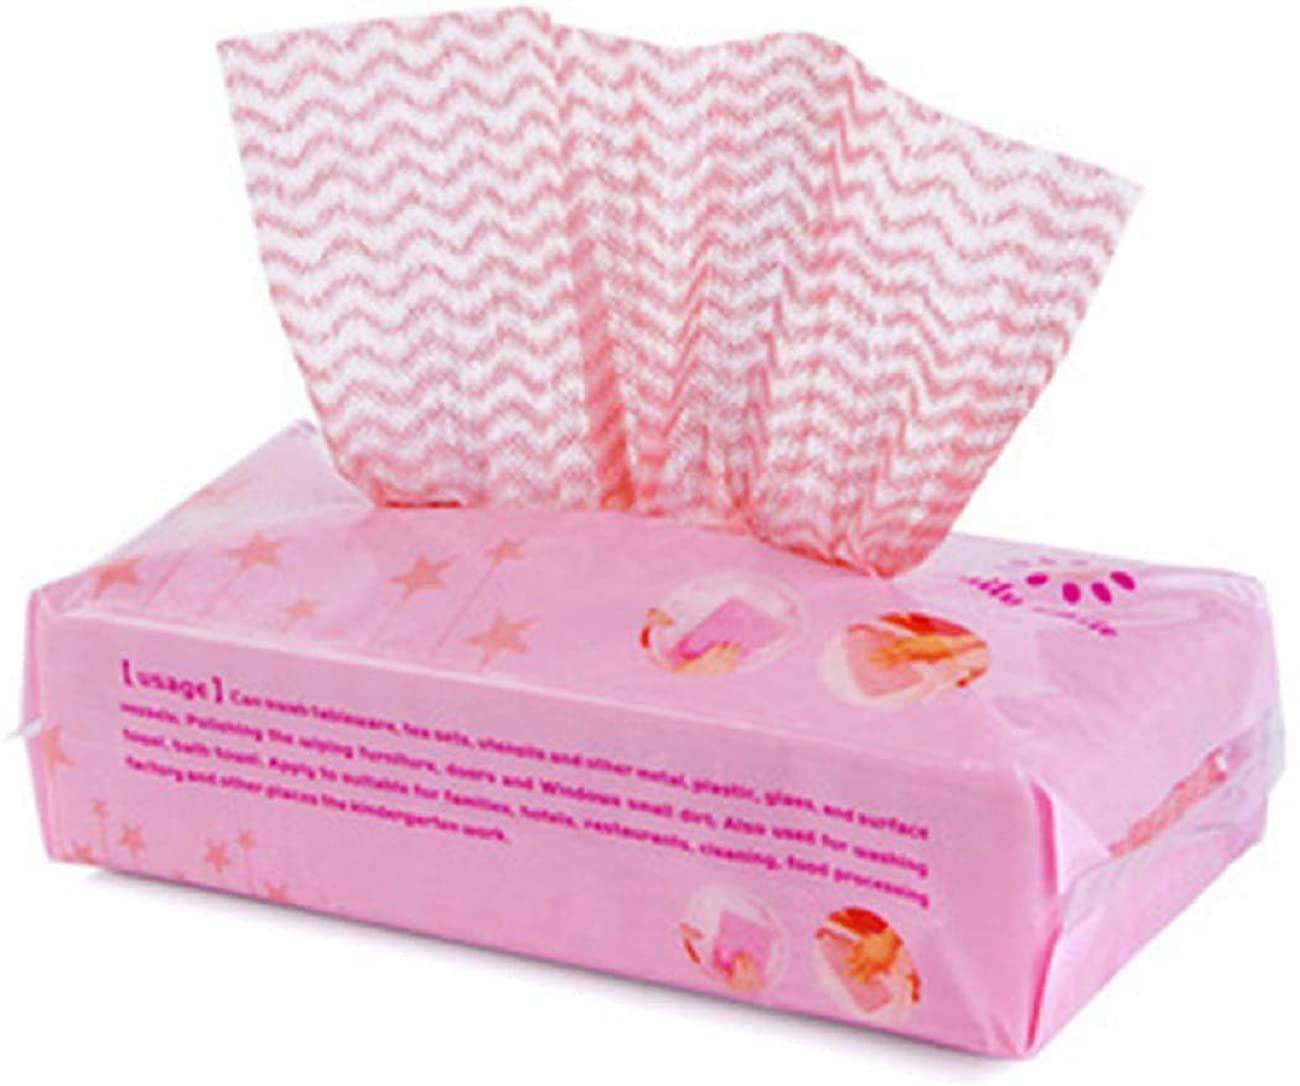 Tsmile 80pcs Disposable Utility Washing Dish Towel Non-Stick Towel Bag Kitchen Bathroom Lazy Rag Disposable Washcloth